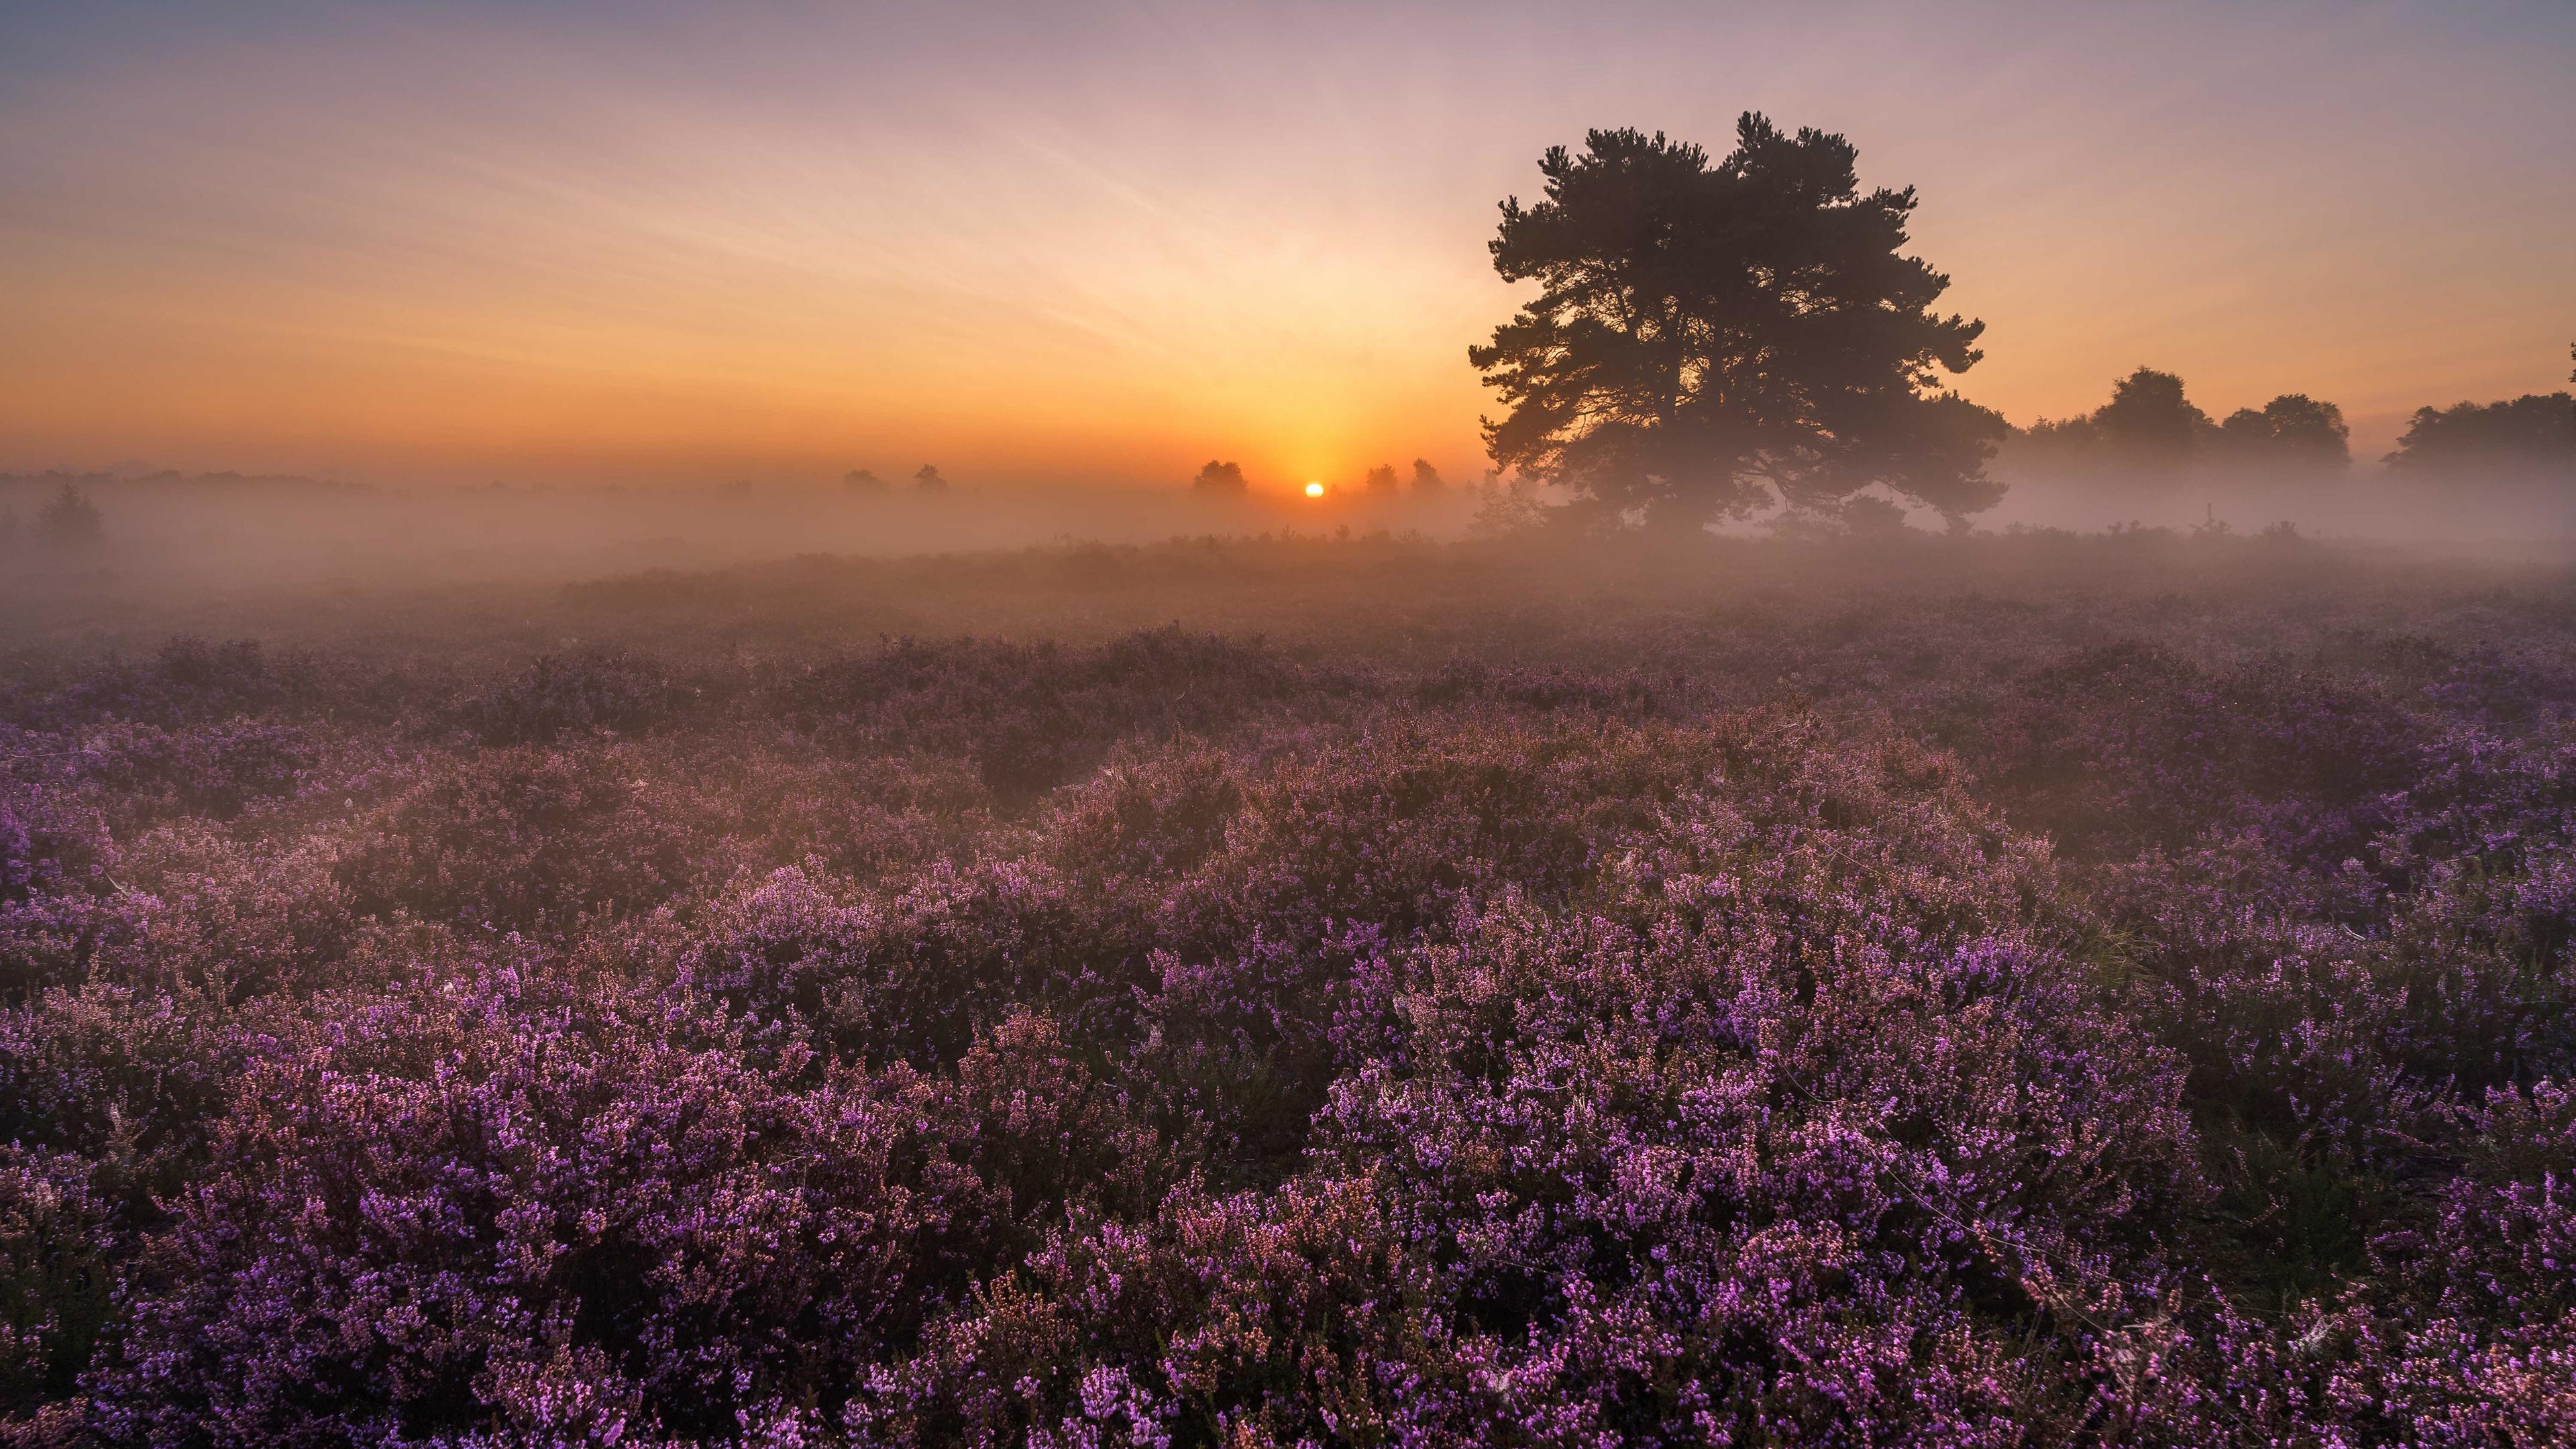 поле цветы рассвет field flowers dawn  № 3837027 без смс